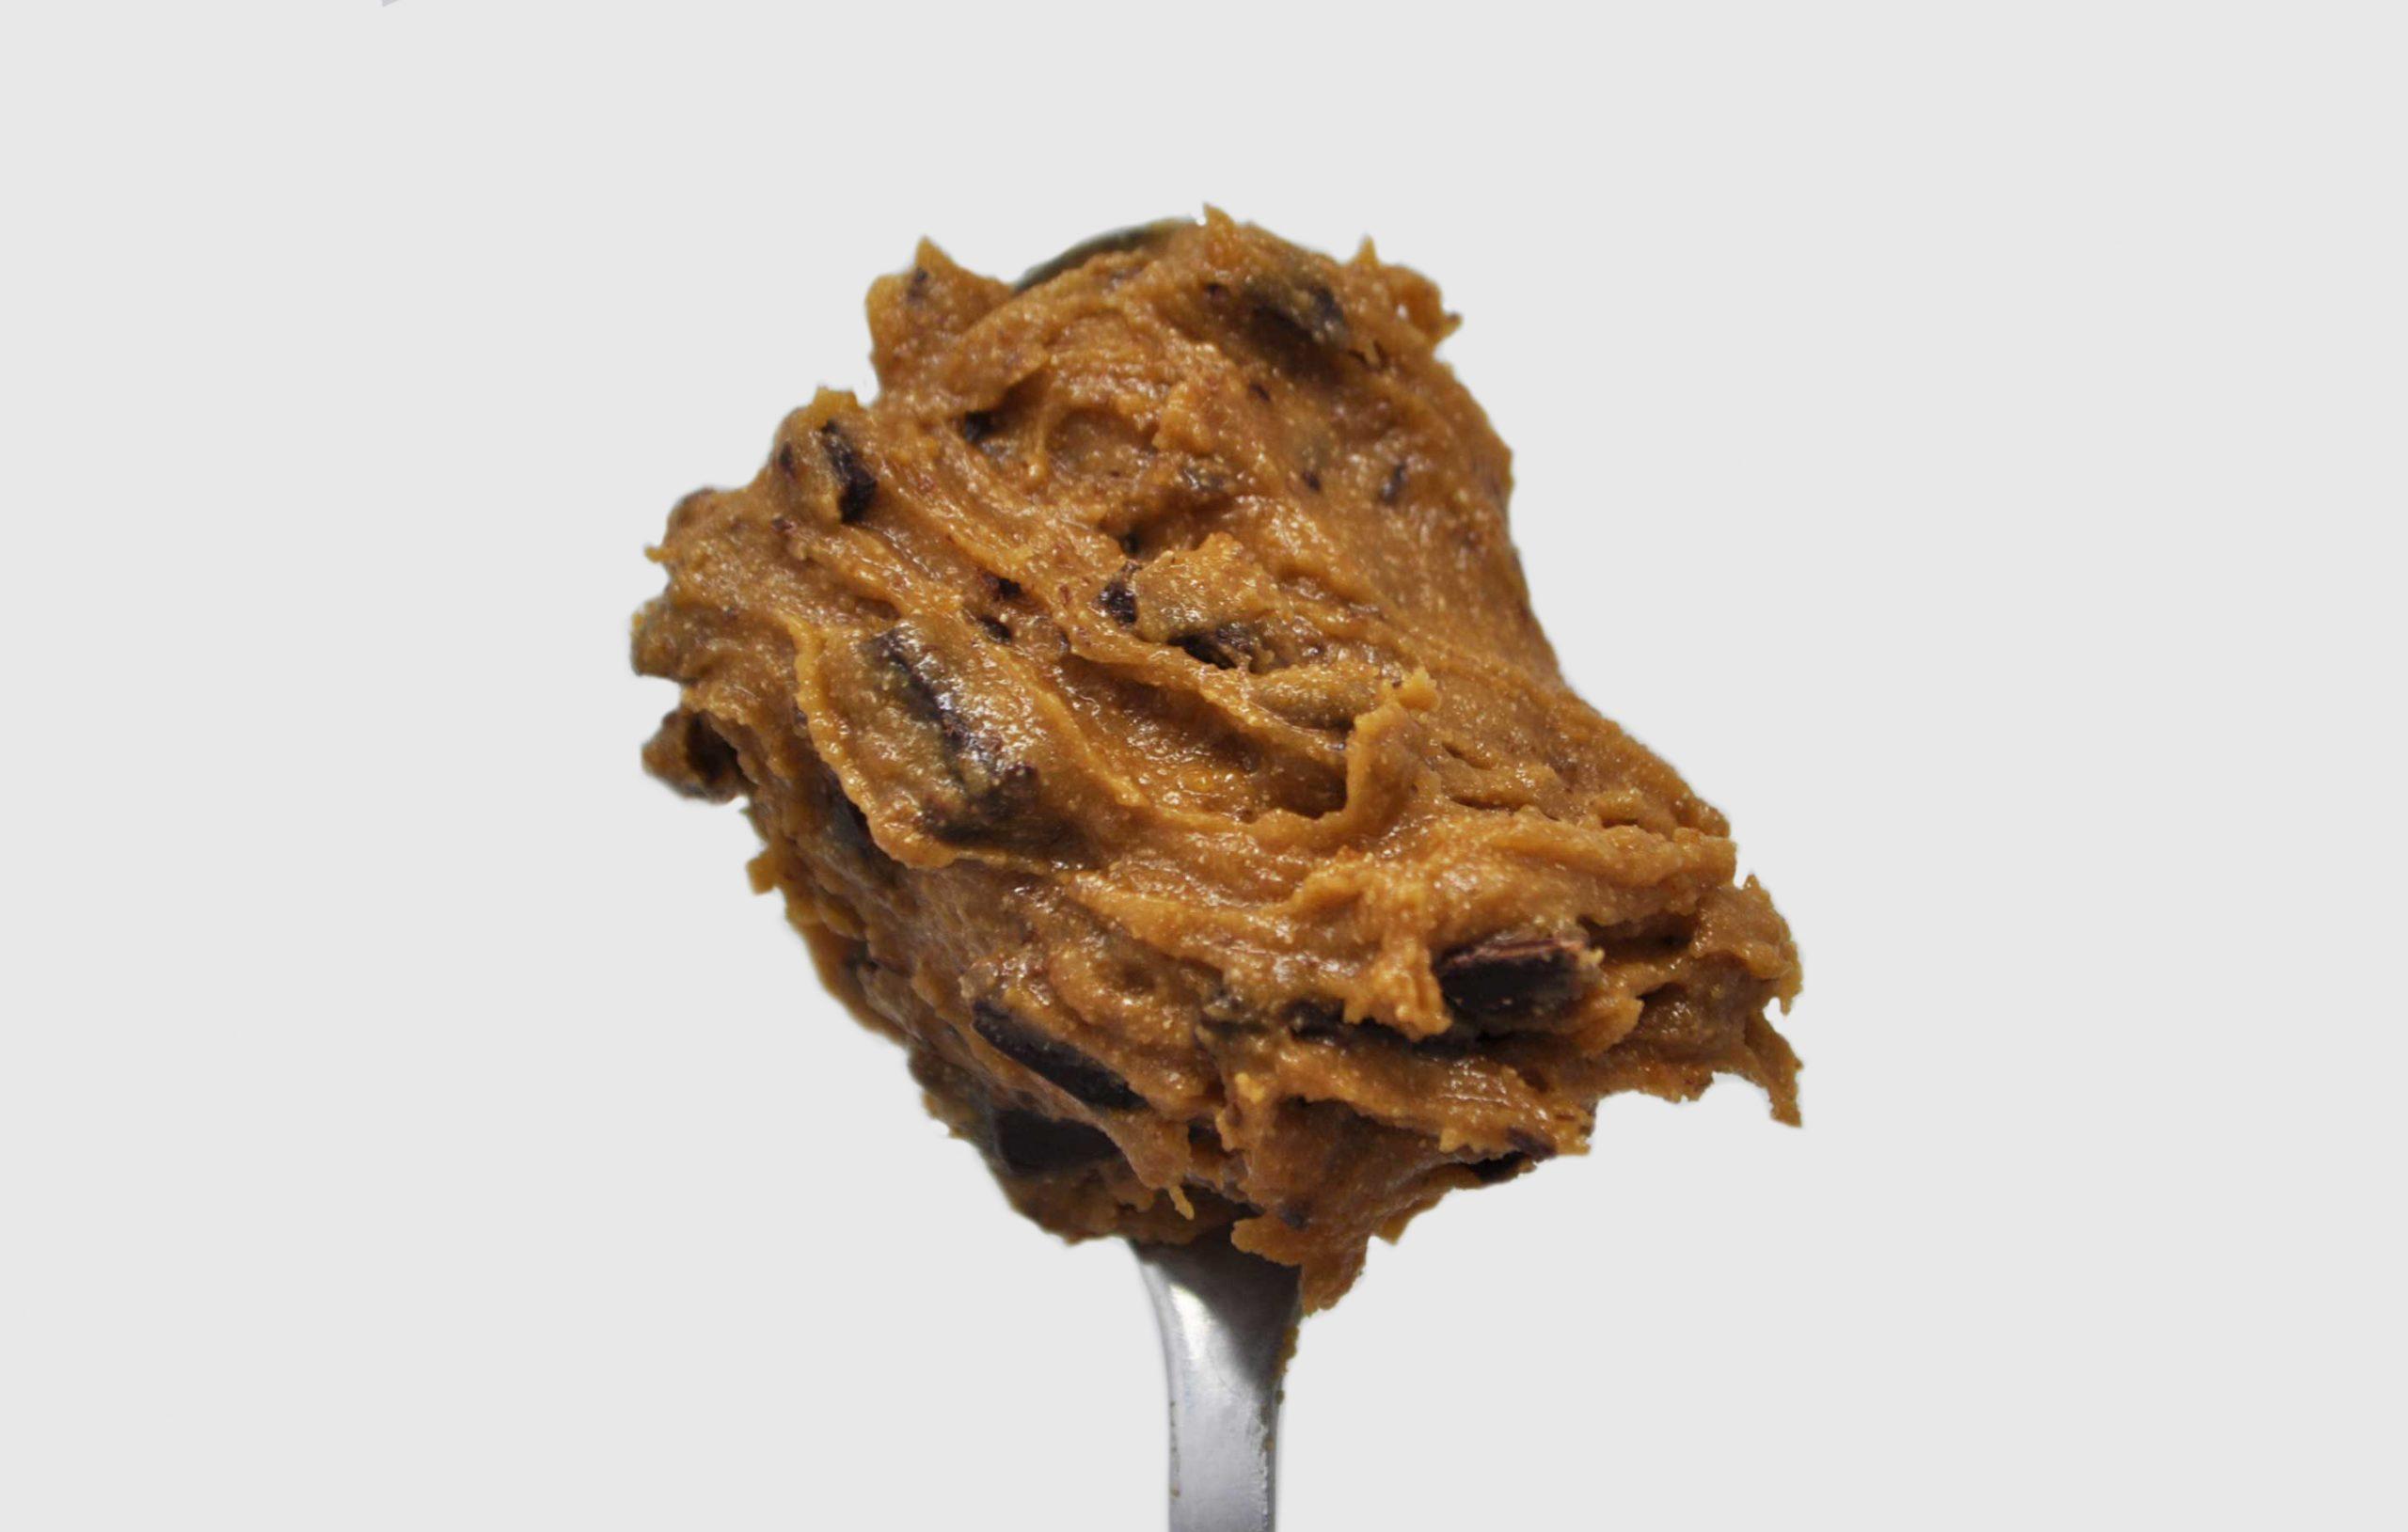 Chickpea Chocolate Chip Cookie Dough Recipe (V + GF)